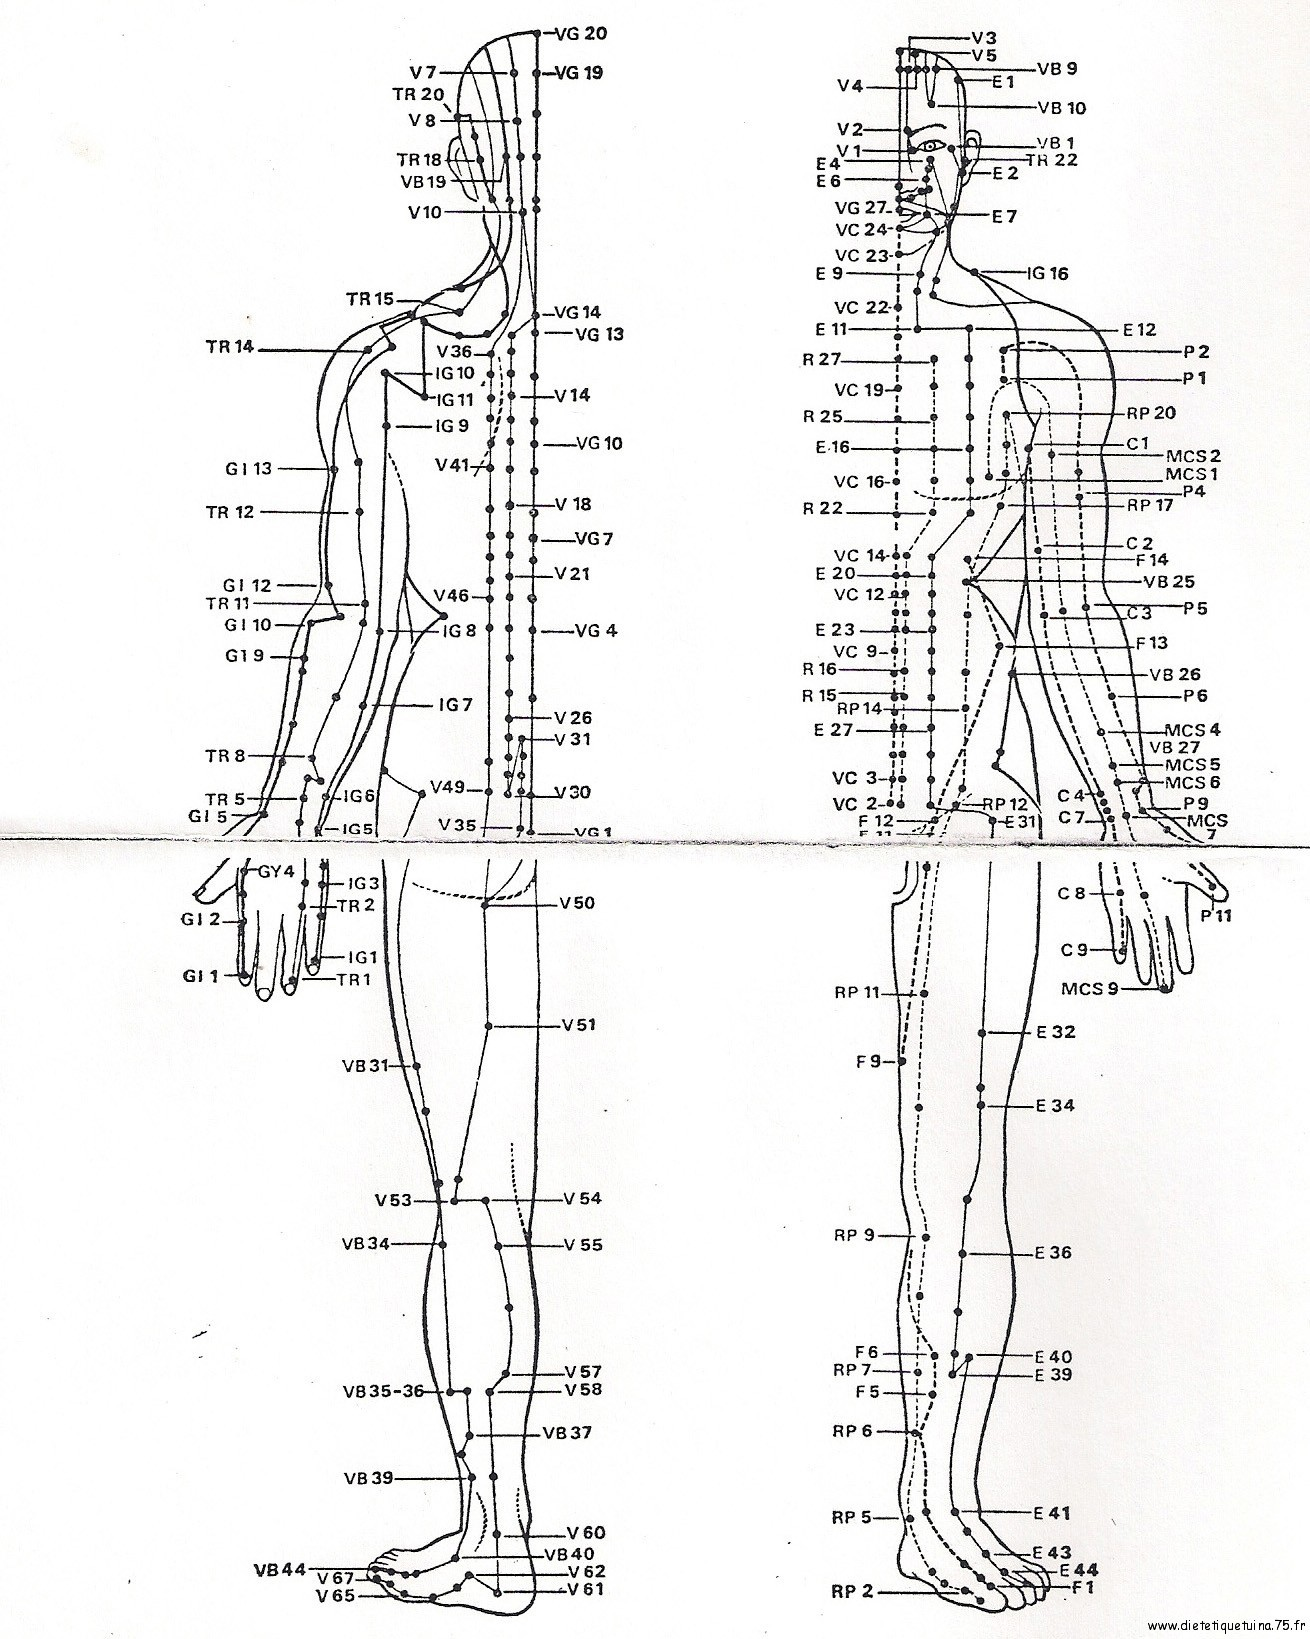 Ii L Acupuncture Une Vision Differente De La Medecine